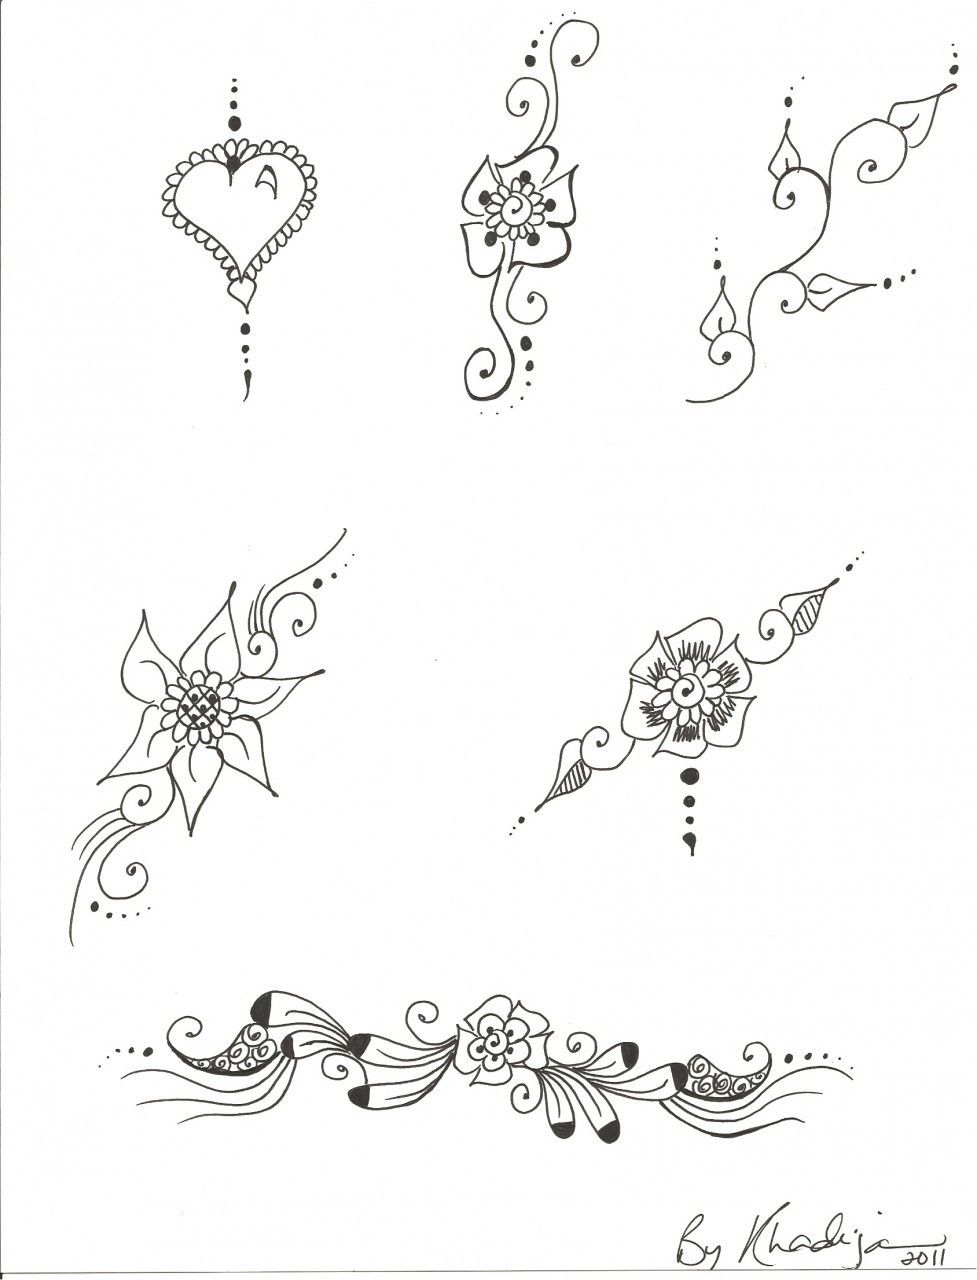 11 Henna Body Art Designs Henna Designs Henna Body Art Henna Tattoo Designs